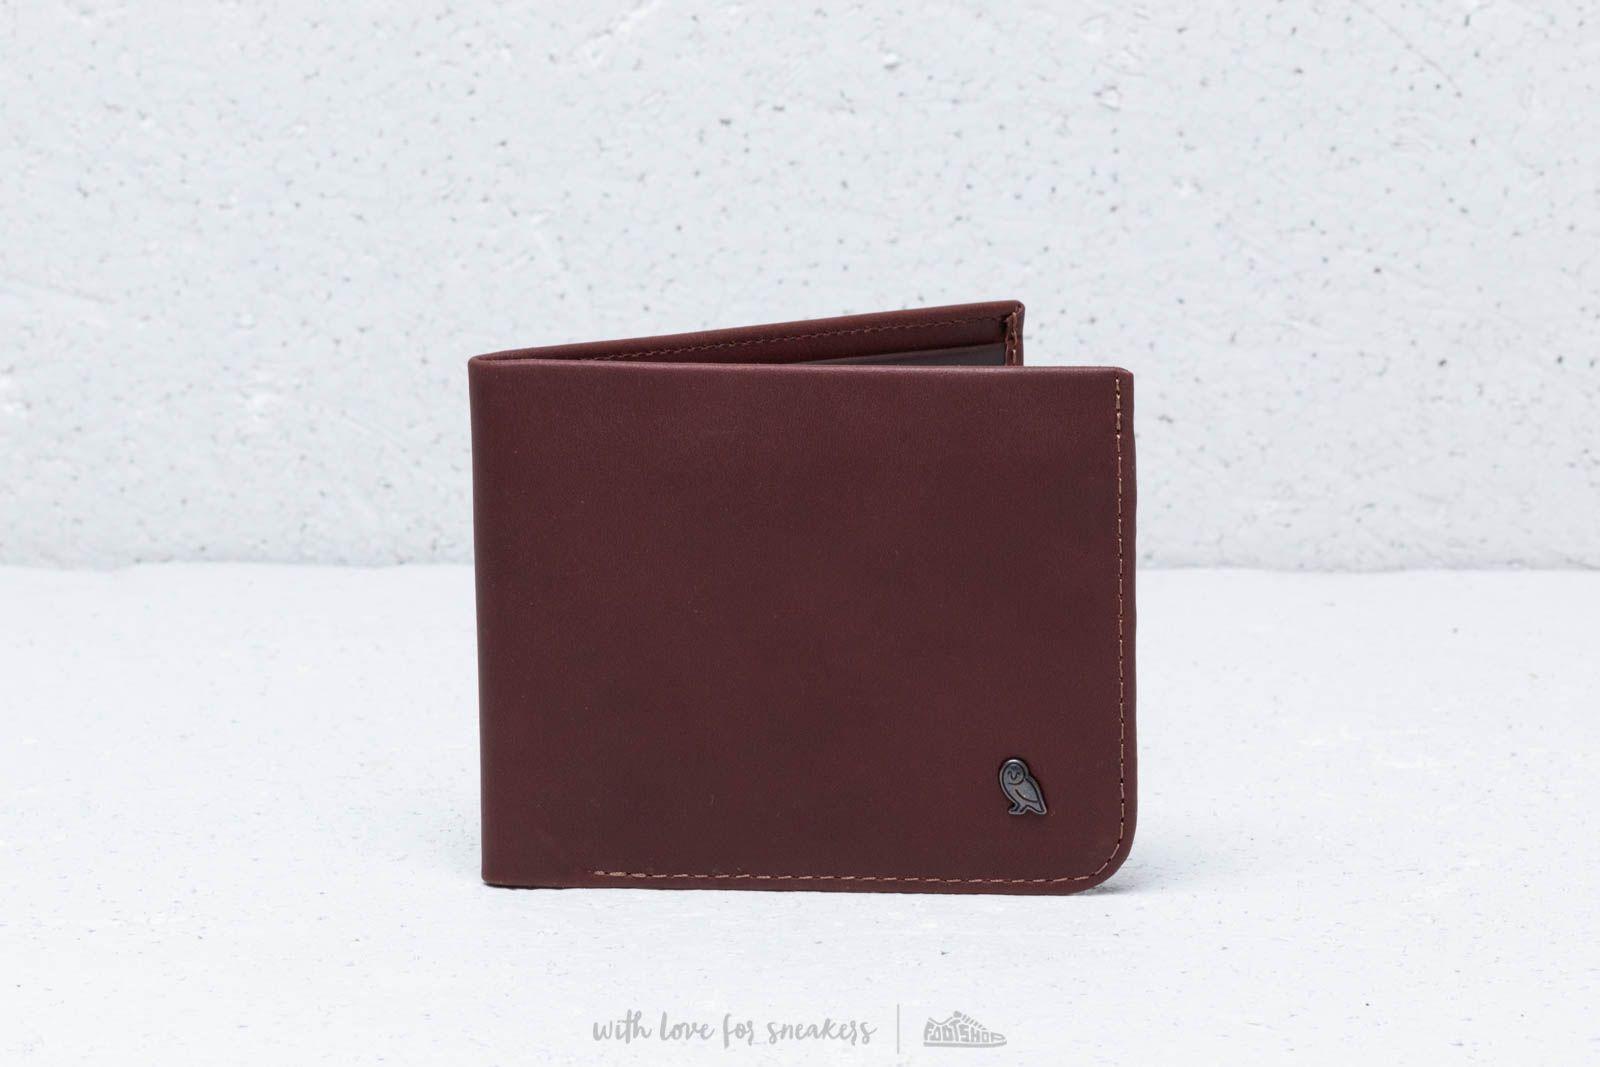 Bellroy Hide and Seek Wallet Cocoa za skvelú cenu 81 € kúpite na Footshop.sk